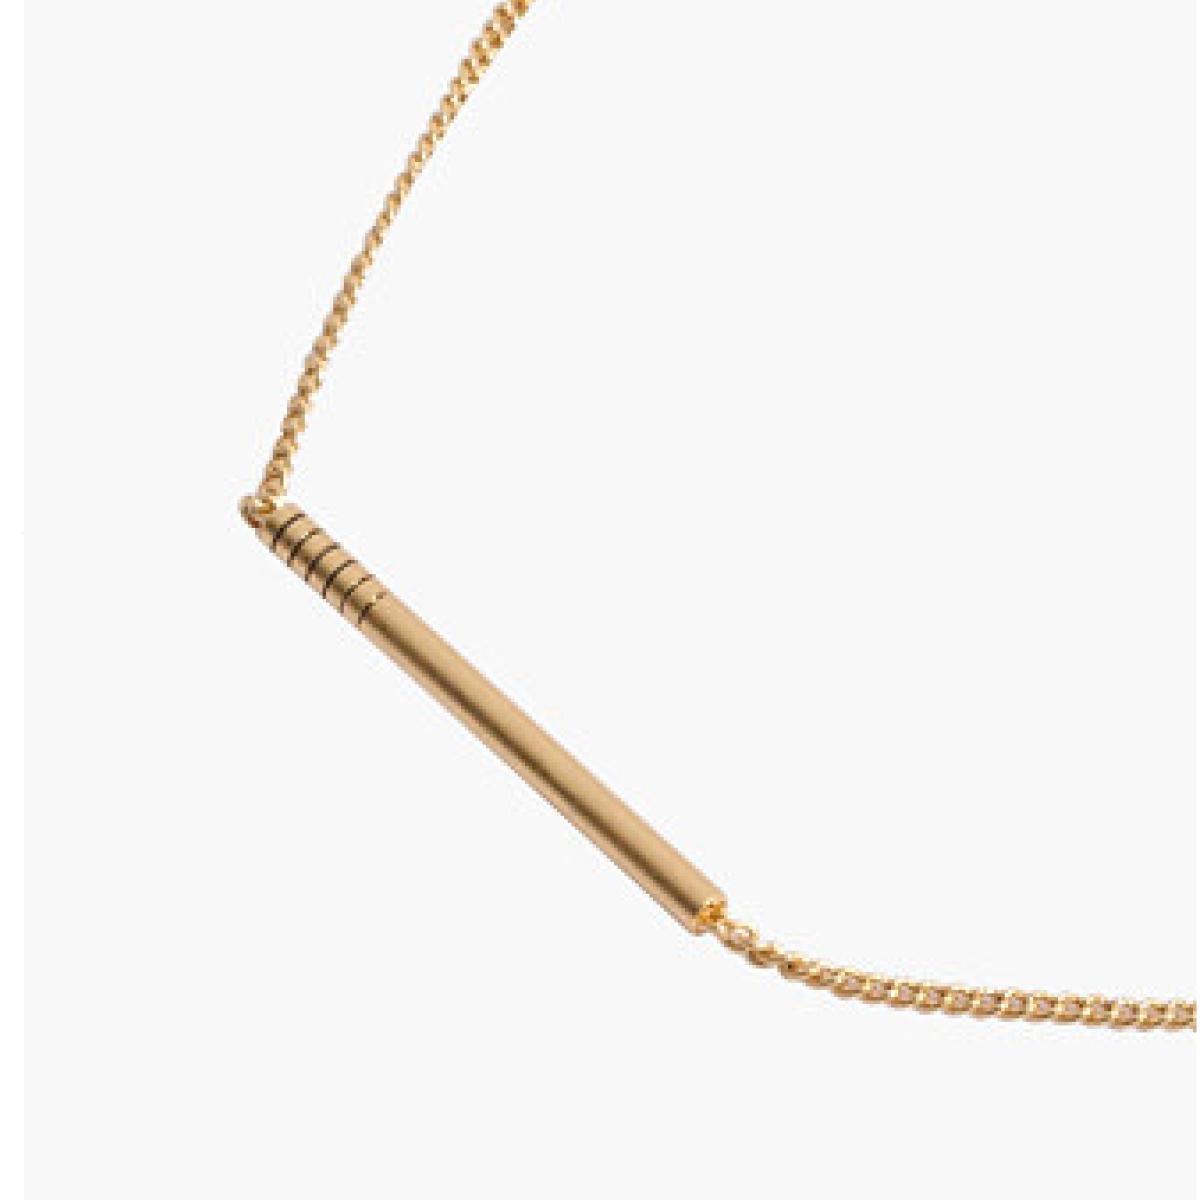 madewell necklace.jpg